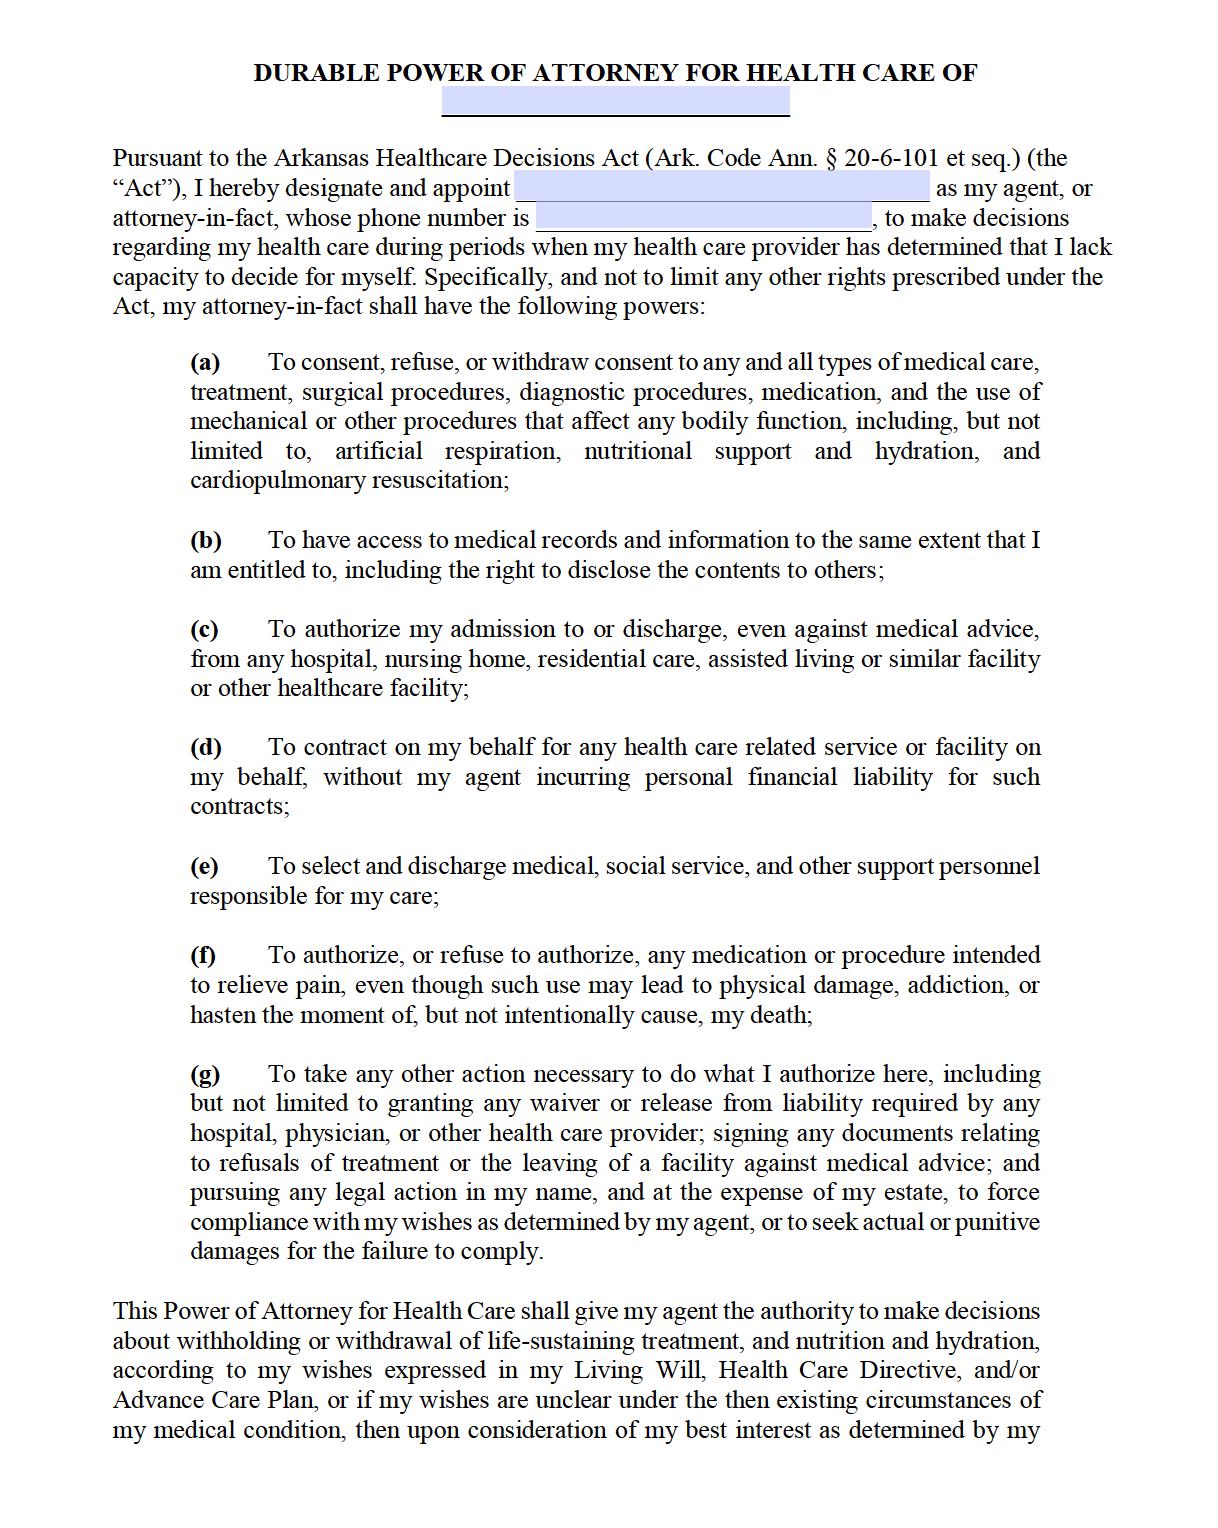 Free Medical Power of Attorney Arkansas Form – Adobe PDF